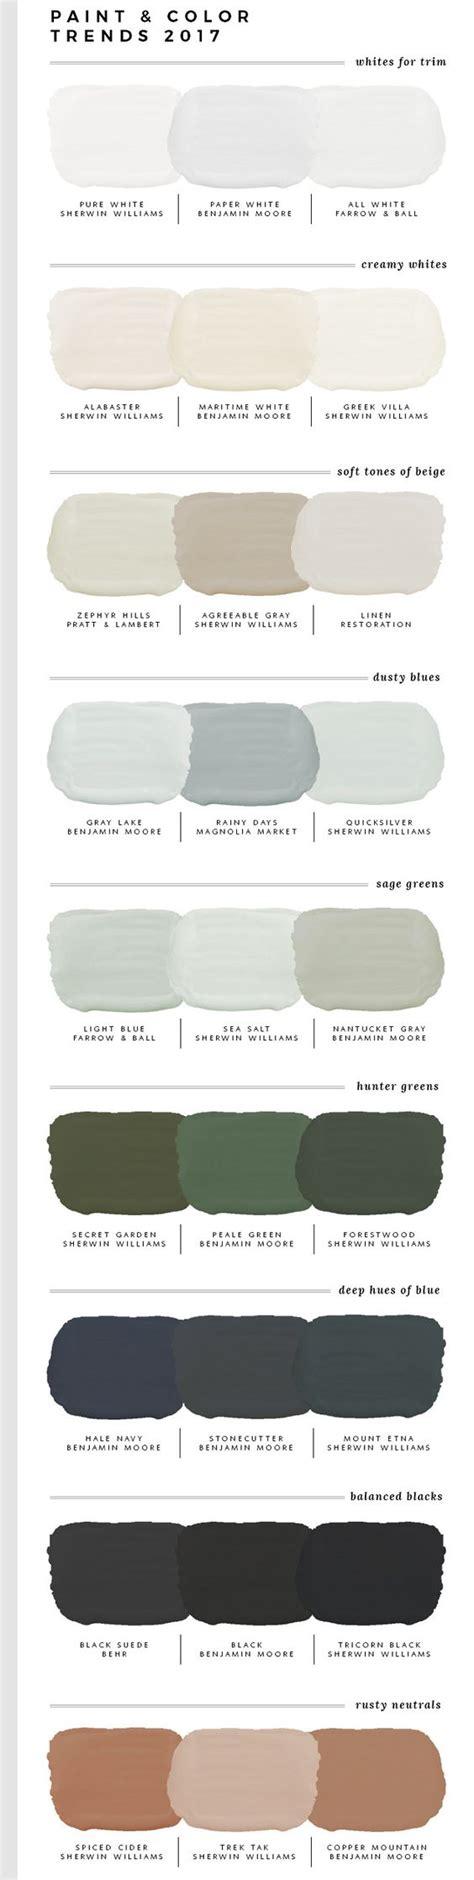 100 paint and color trends 2017 bedroom magnificent 100 2017 color trends best paint kitchen painted